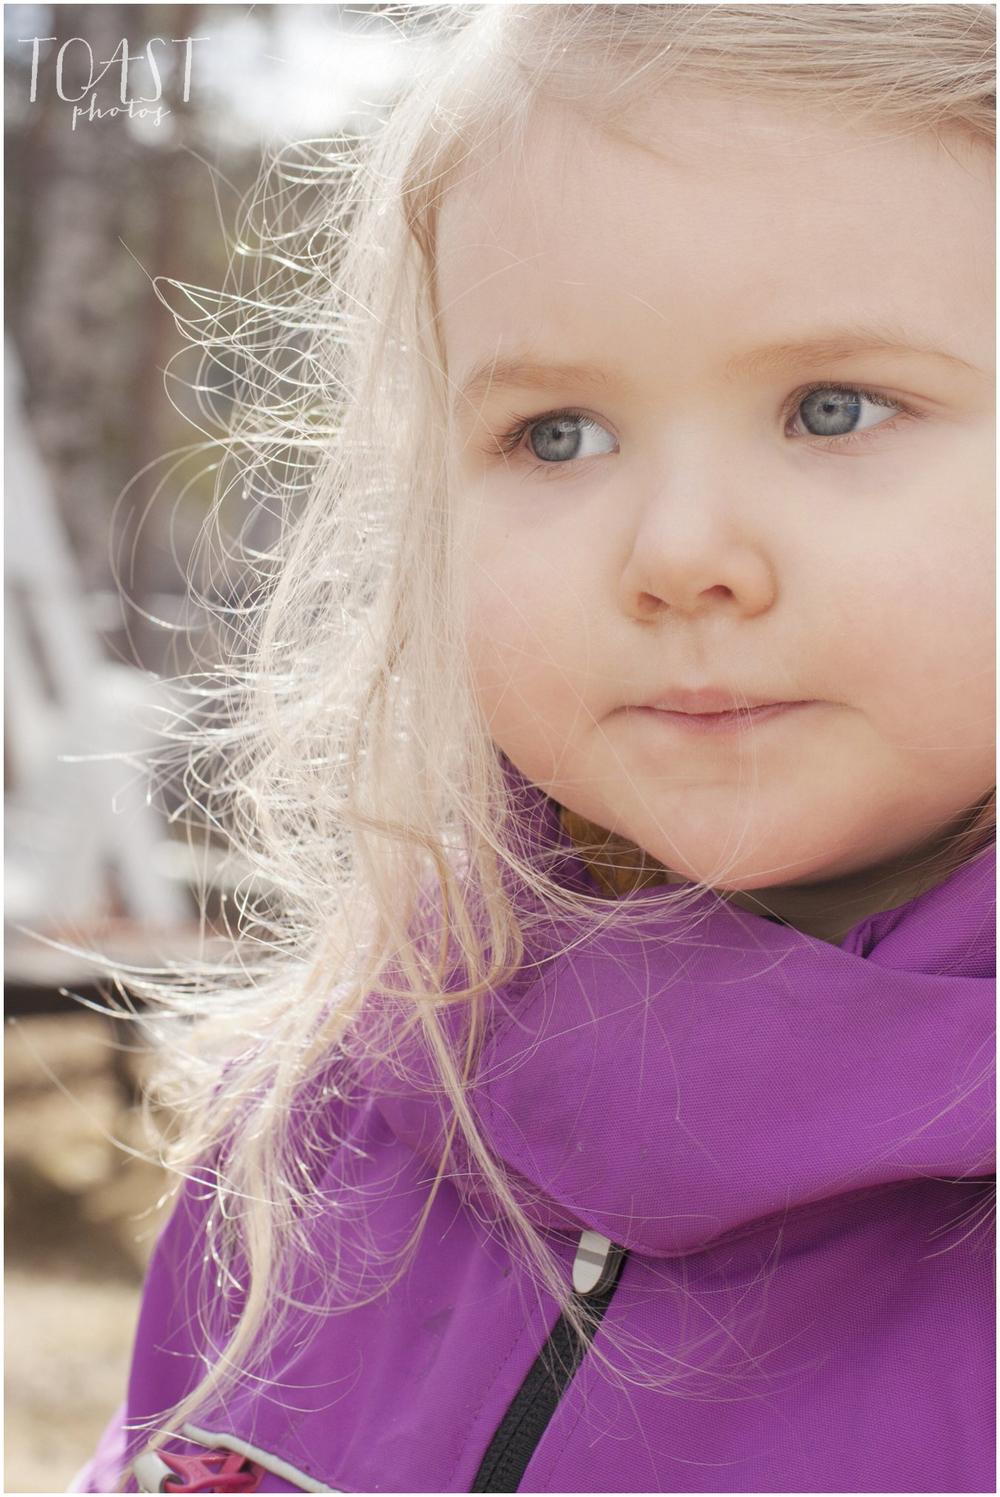 Miljöökuvausta-kolmevuotiaasta